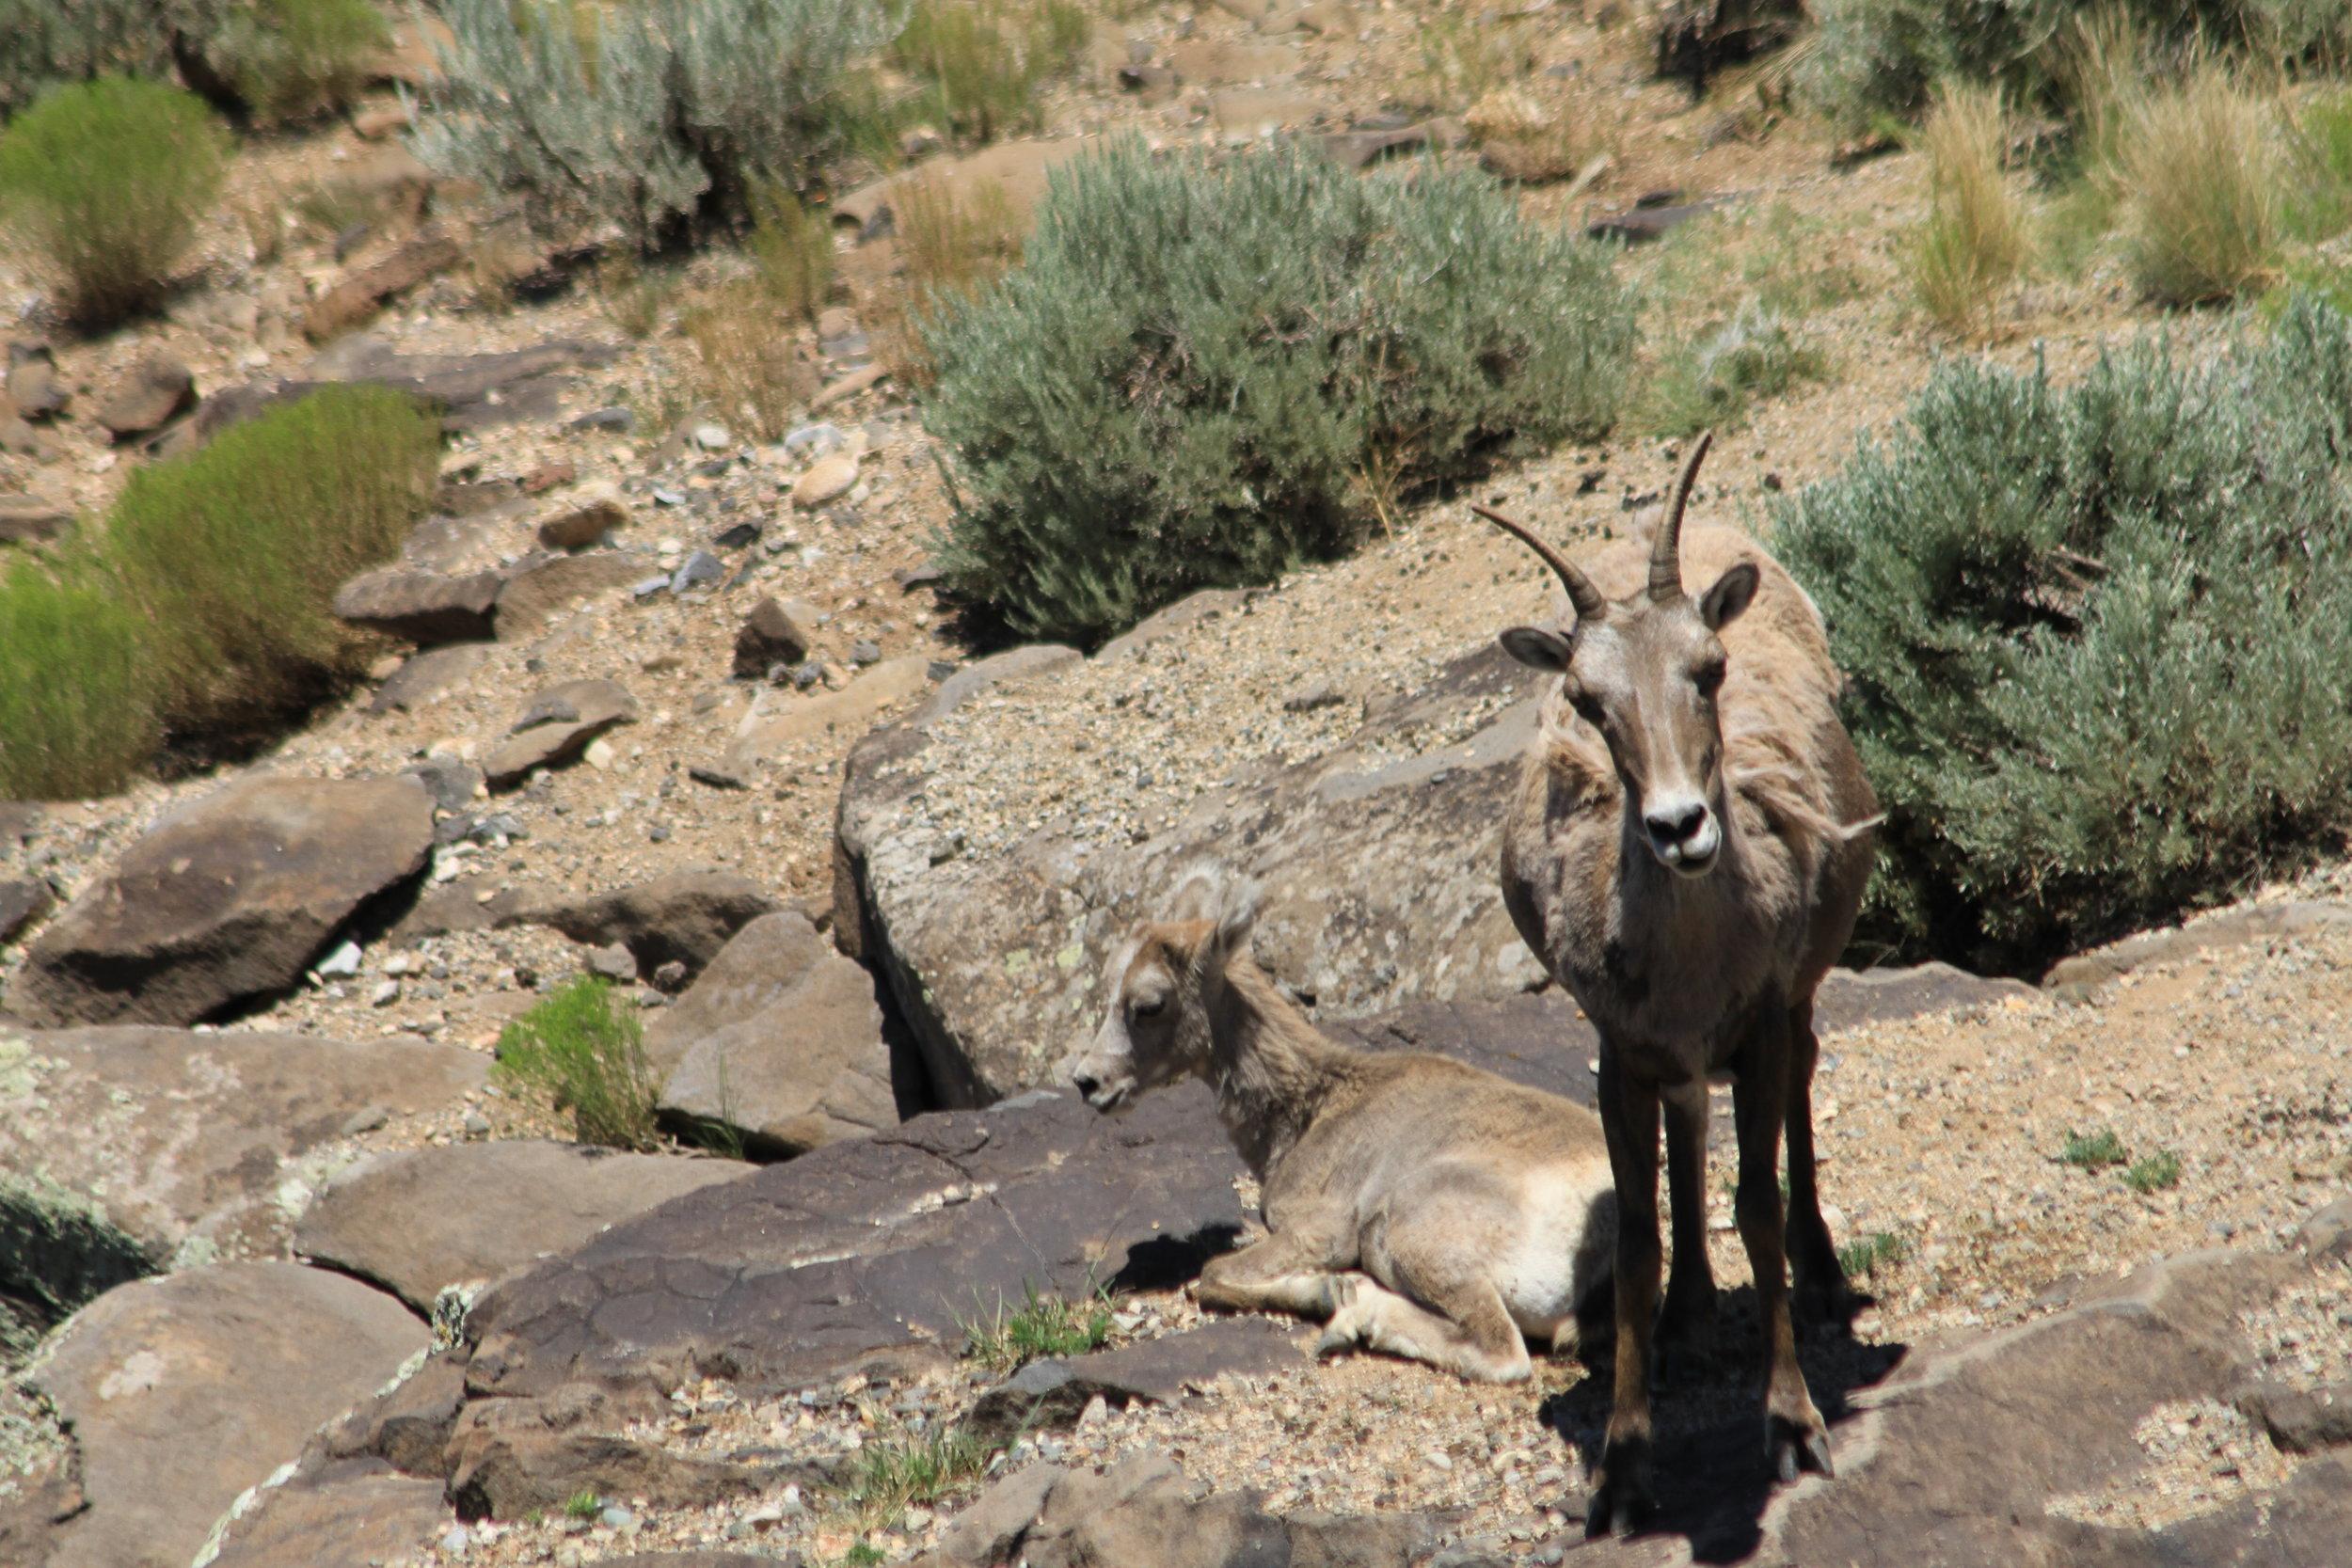 Bighorn Sheep - Taos, New Mexico